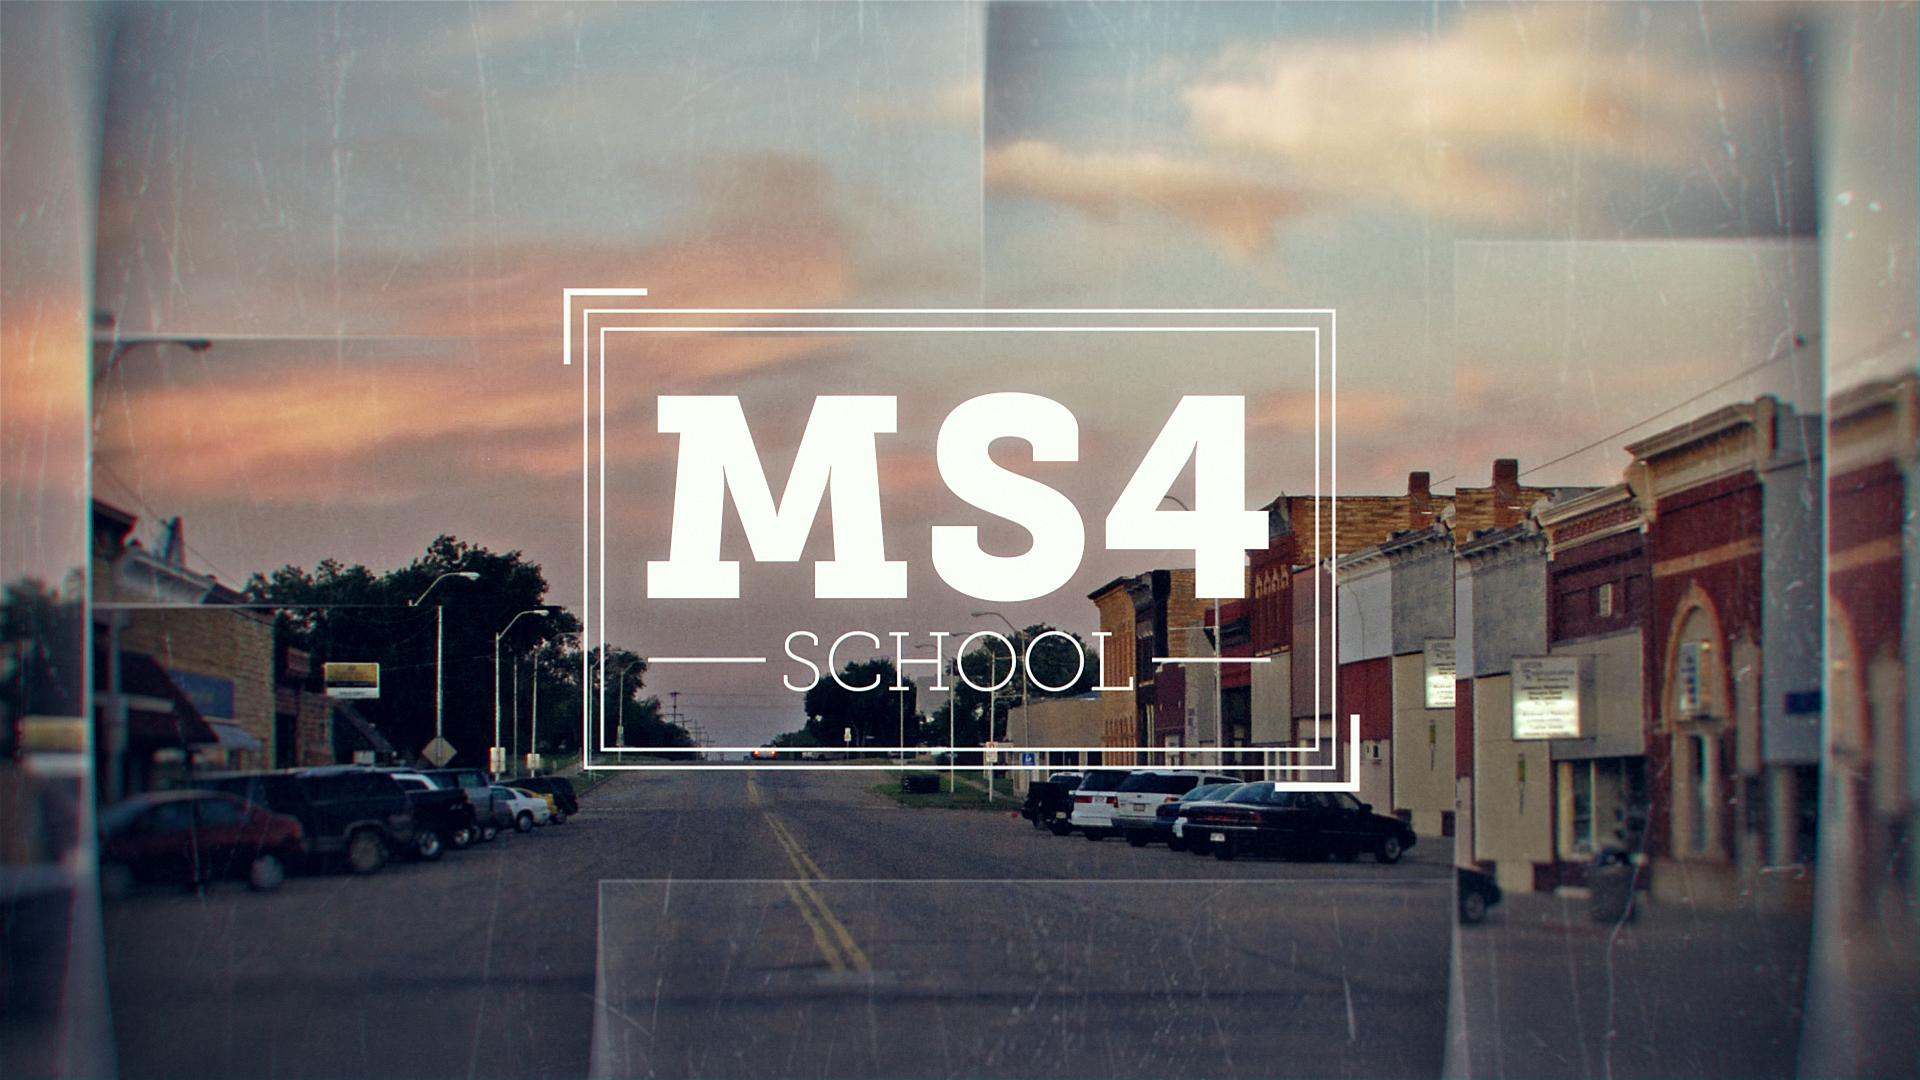 MS4 School